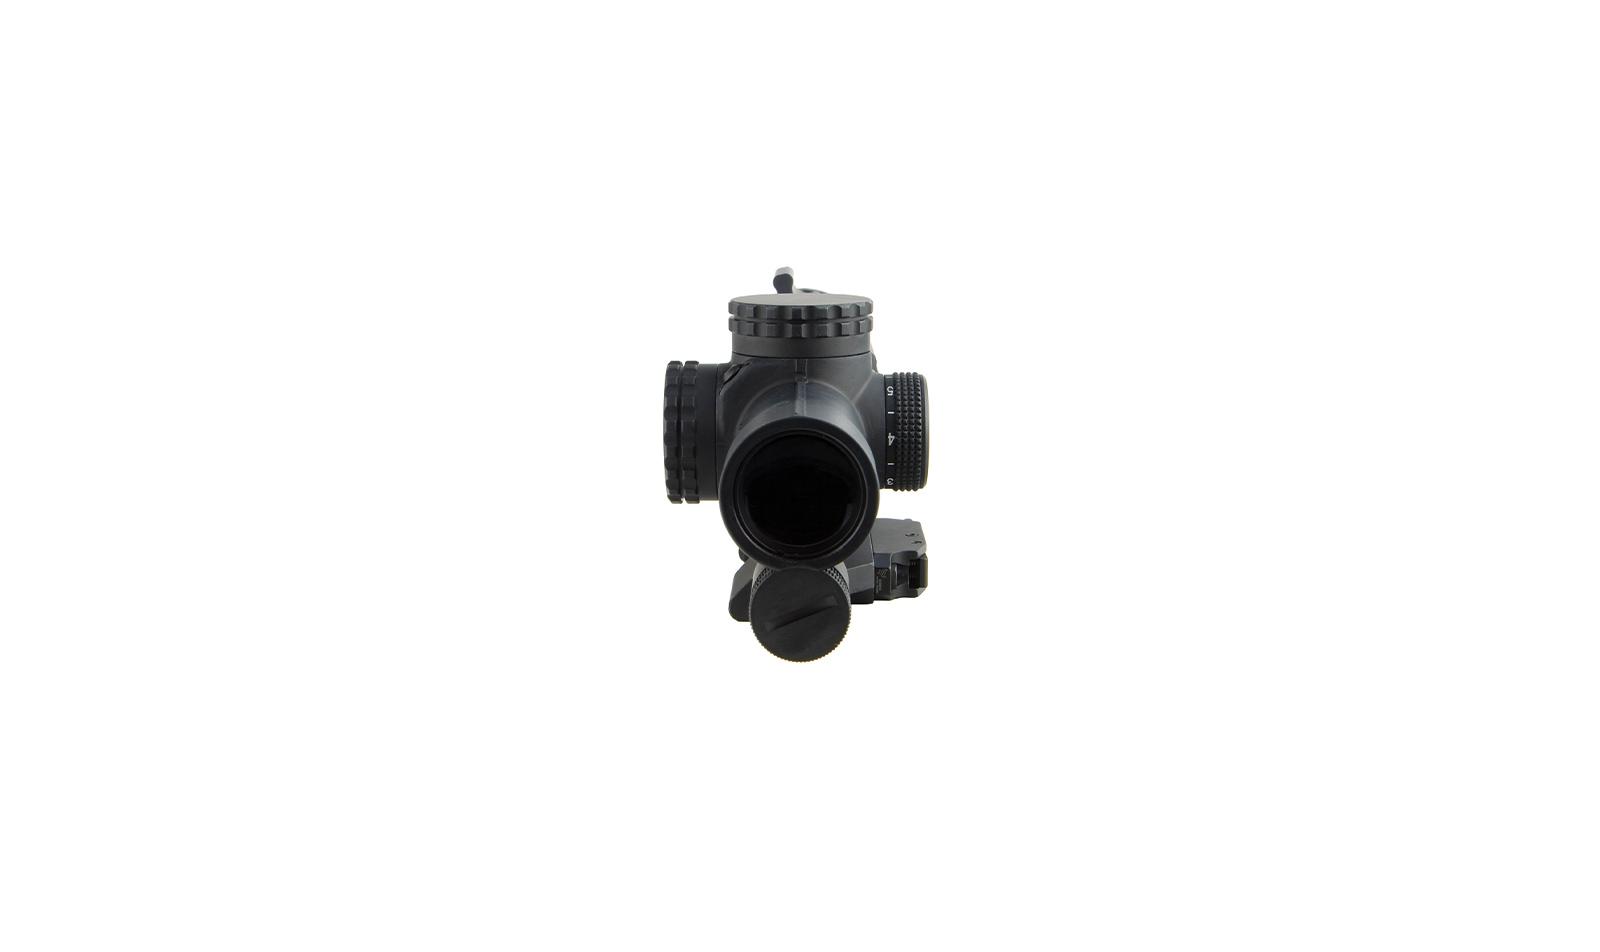 VC16-C-1600010 angle 8